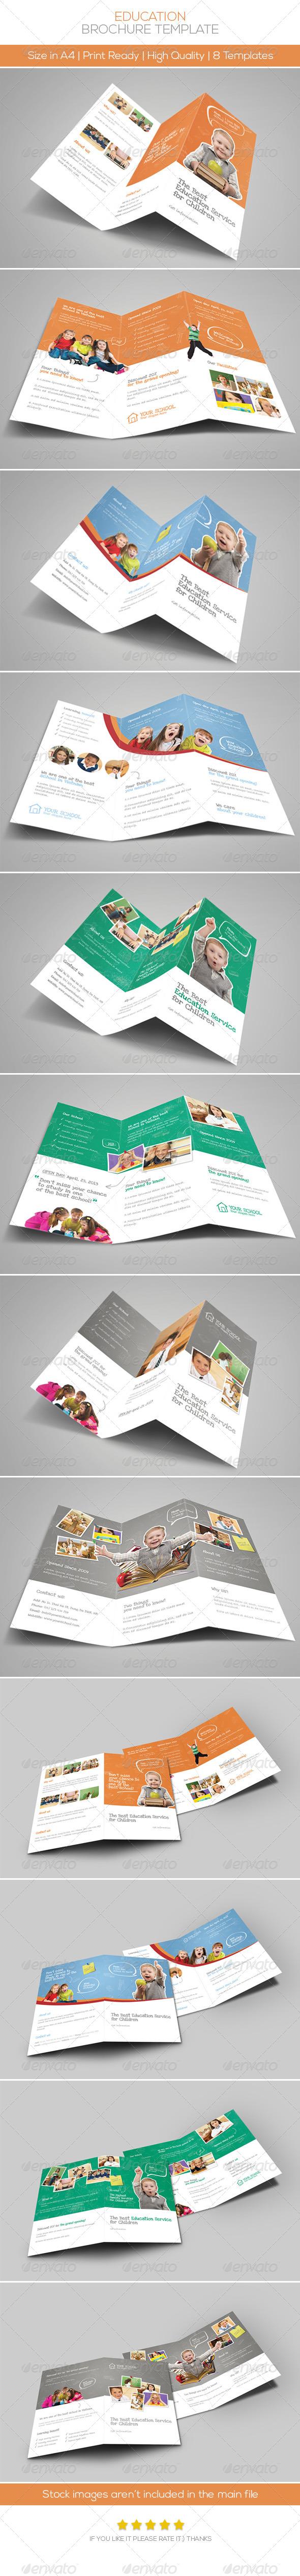 Premium Education Brochure Tri-fold & Bi-fold - Brochures Print Templates